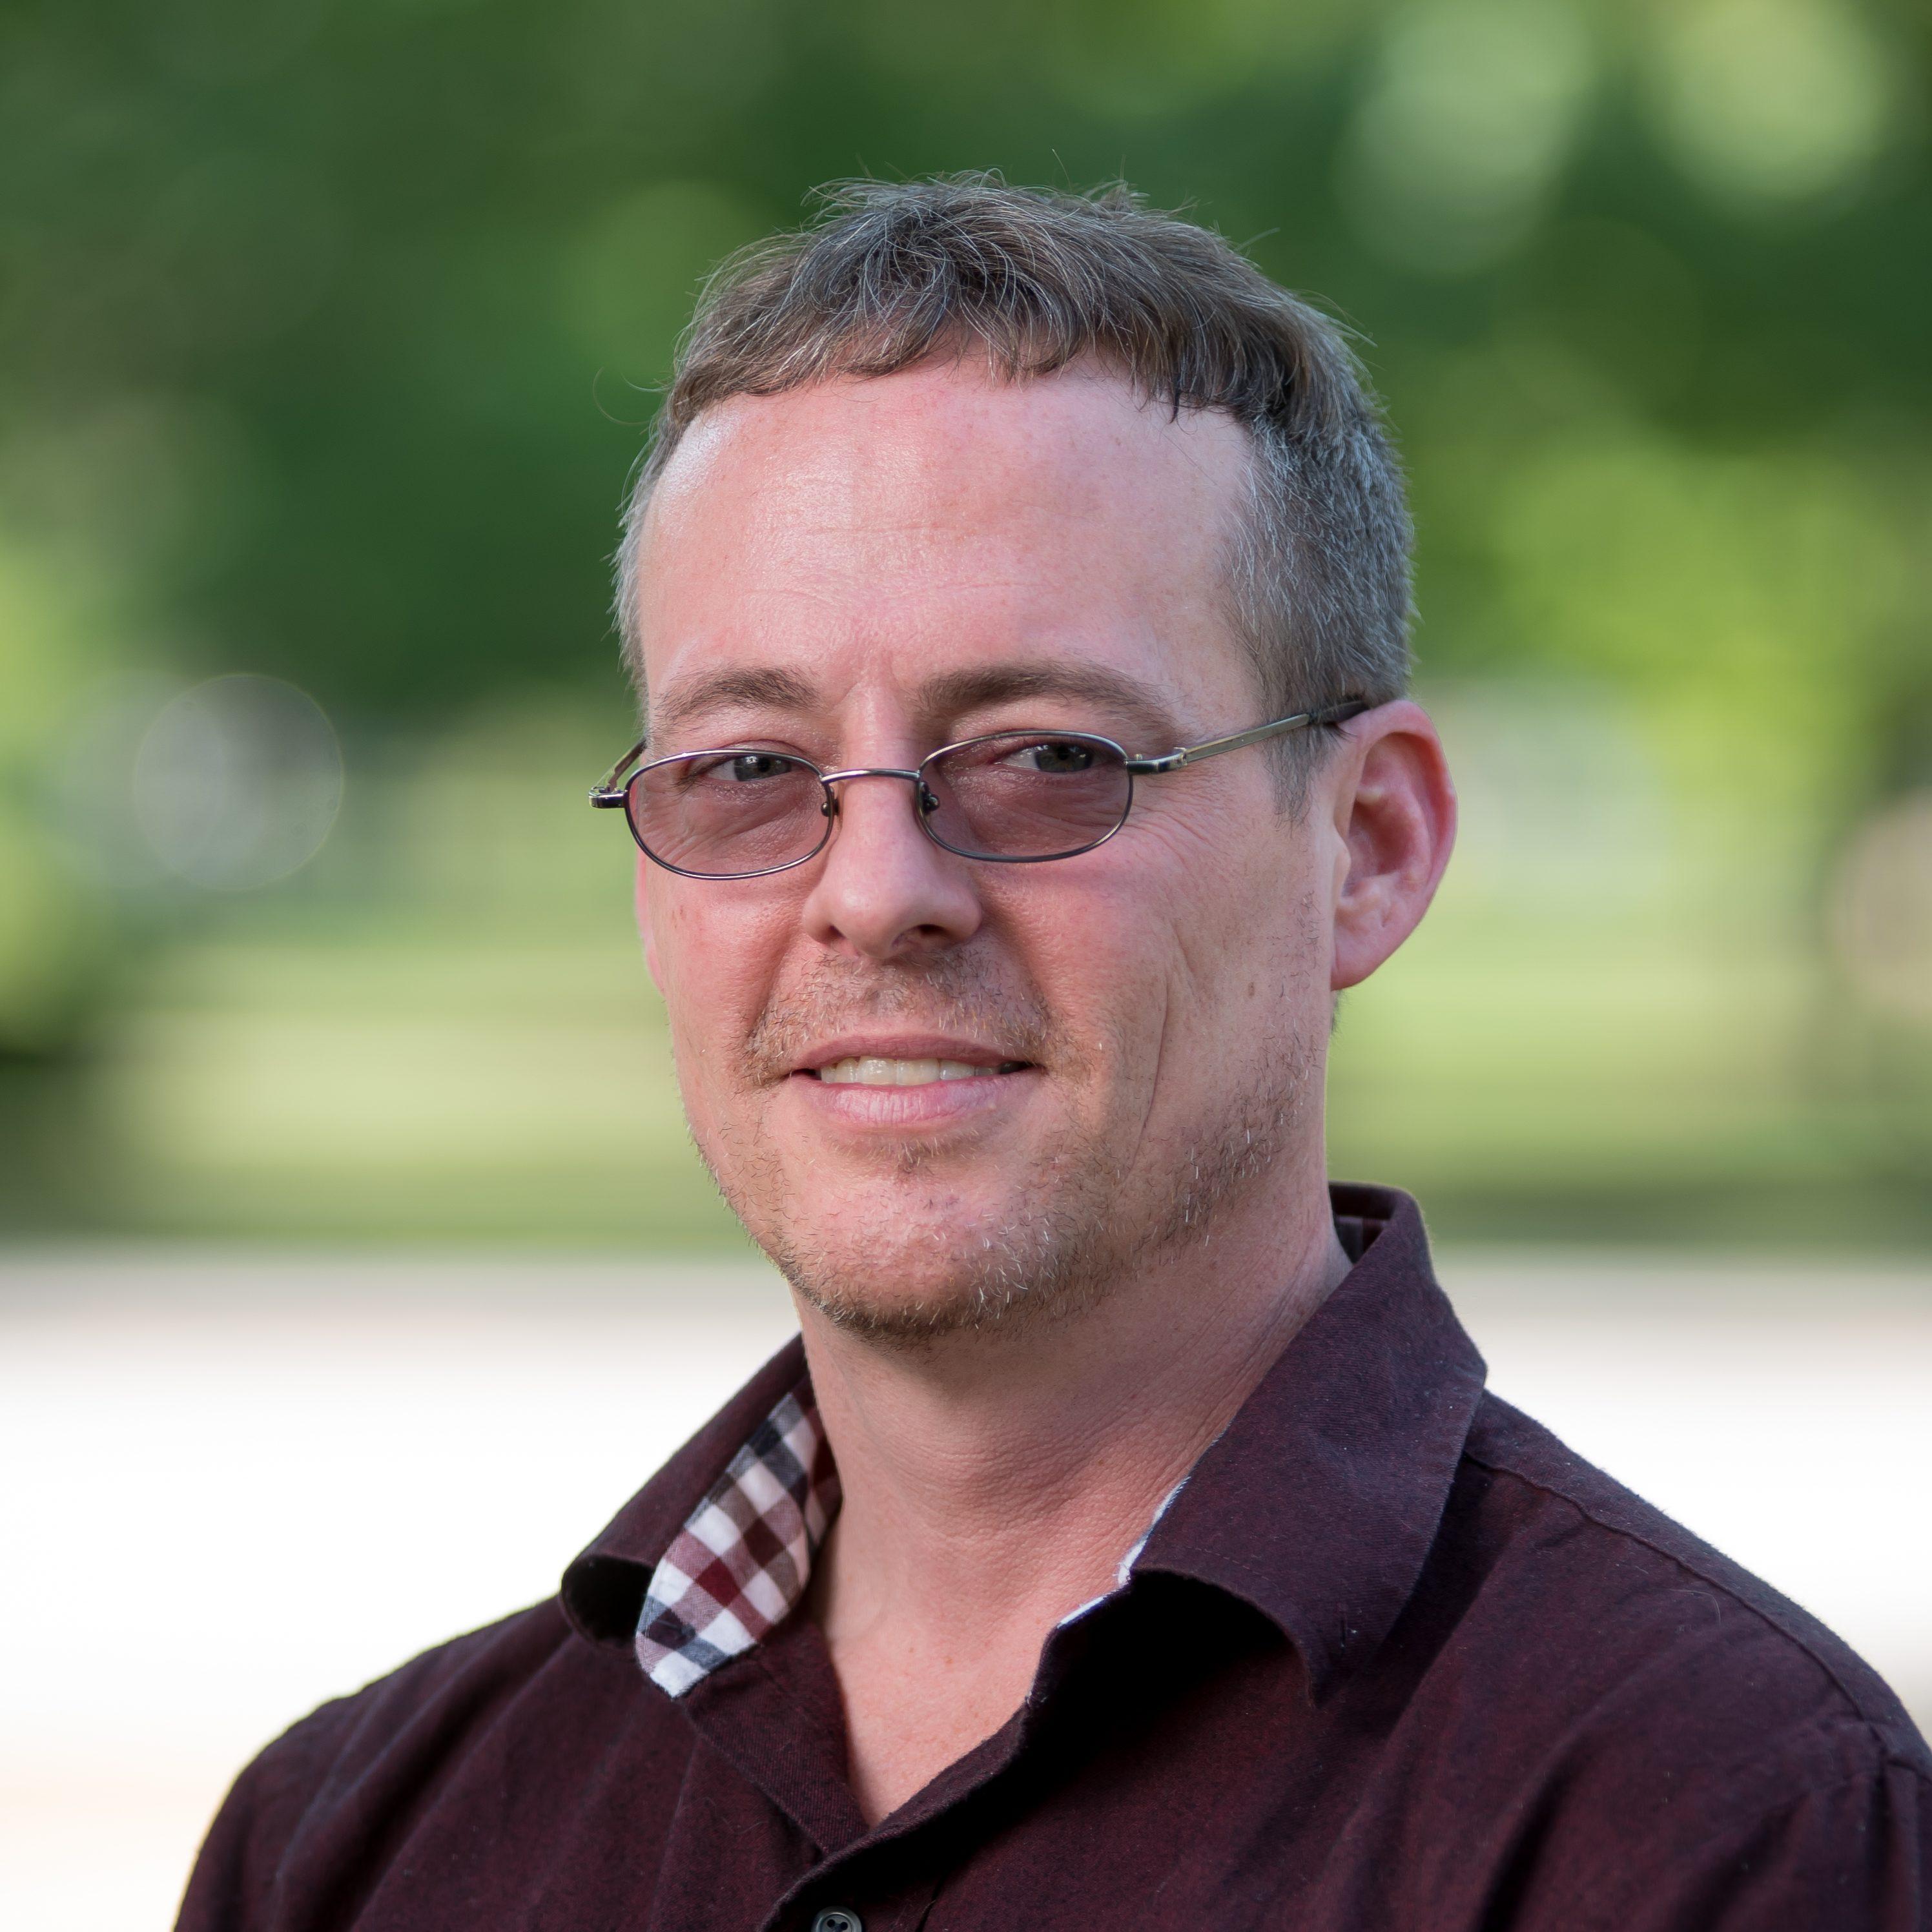 Brad Hodges